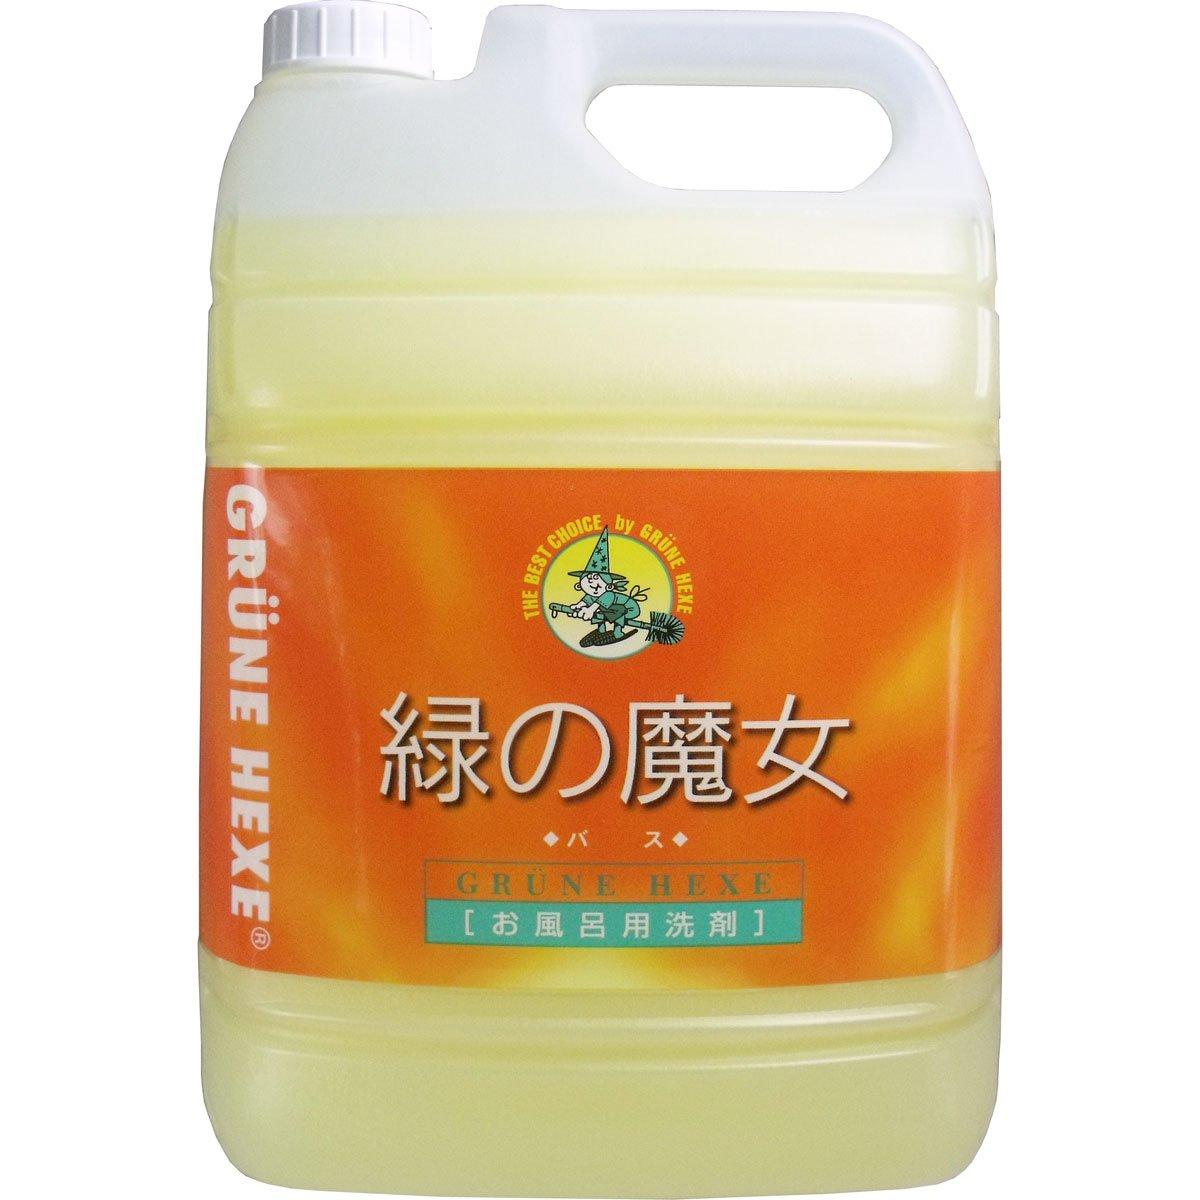 緑の魔女 バス用洗剤 業務用 5L B00FWO615M